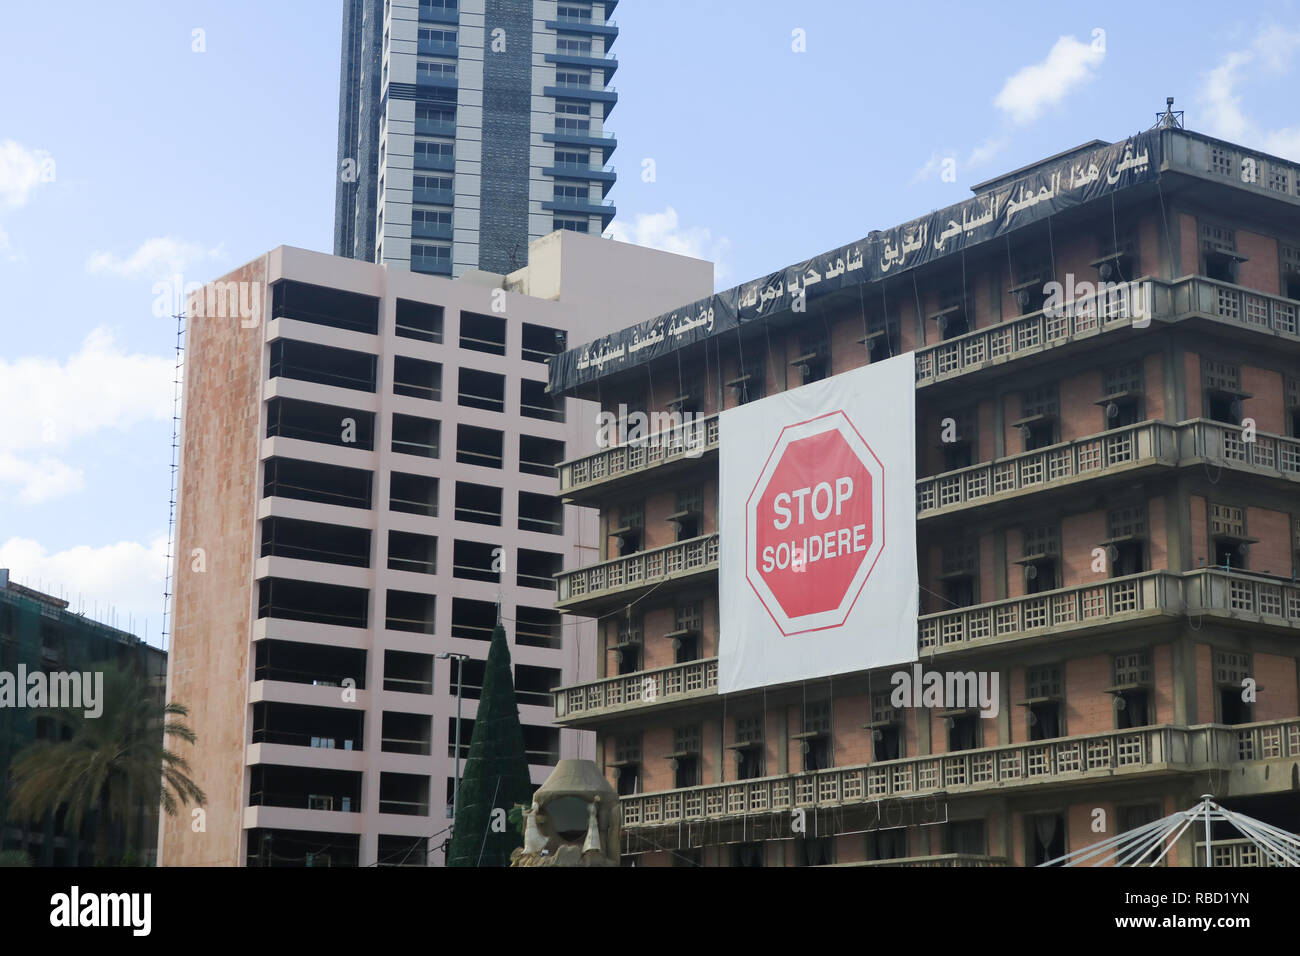 Beirut, Lebanon  9th Jan, 2019  Saint George Hotel a